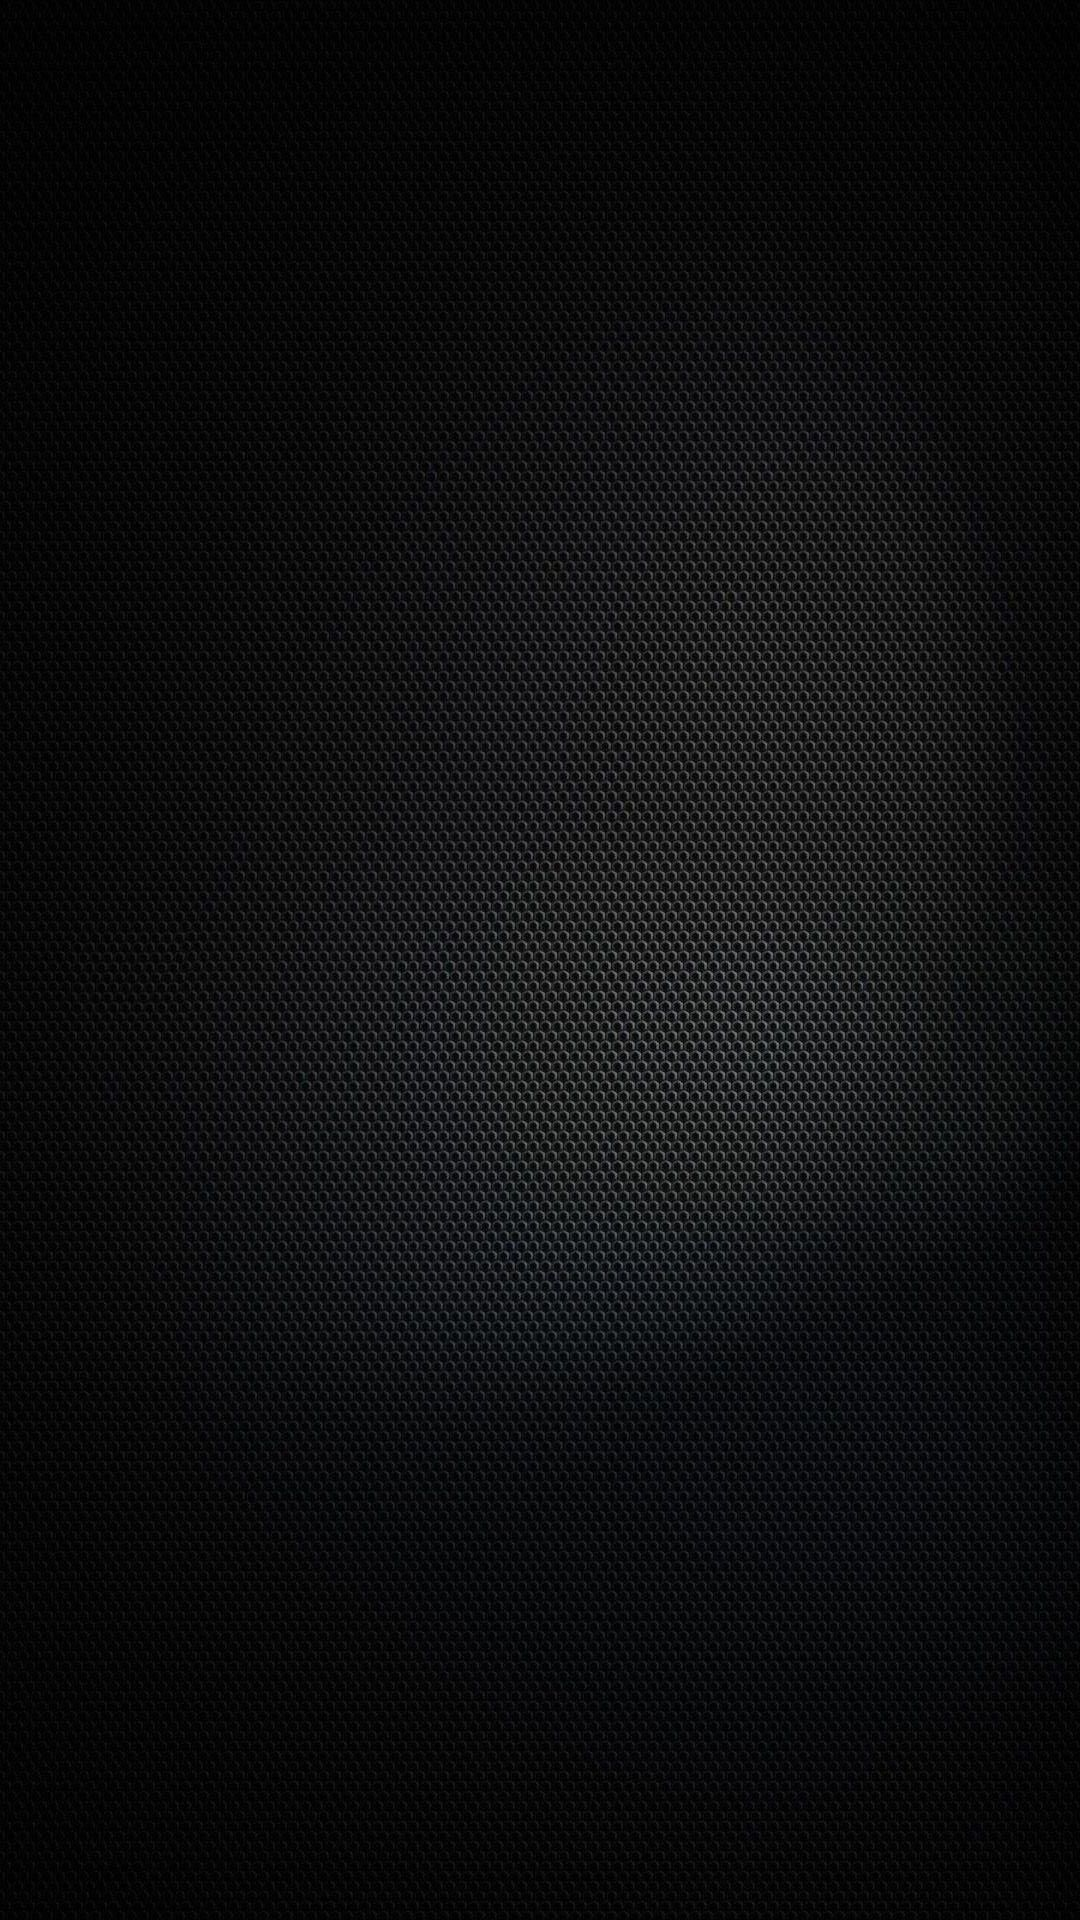 Pure Black Wallpaper